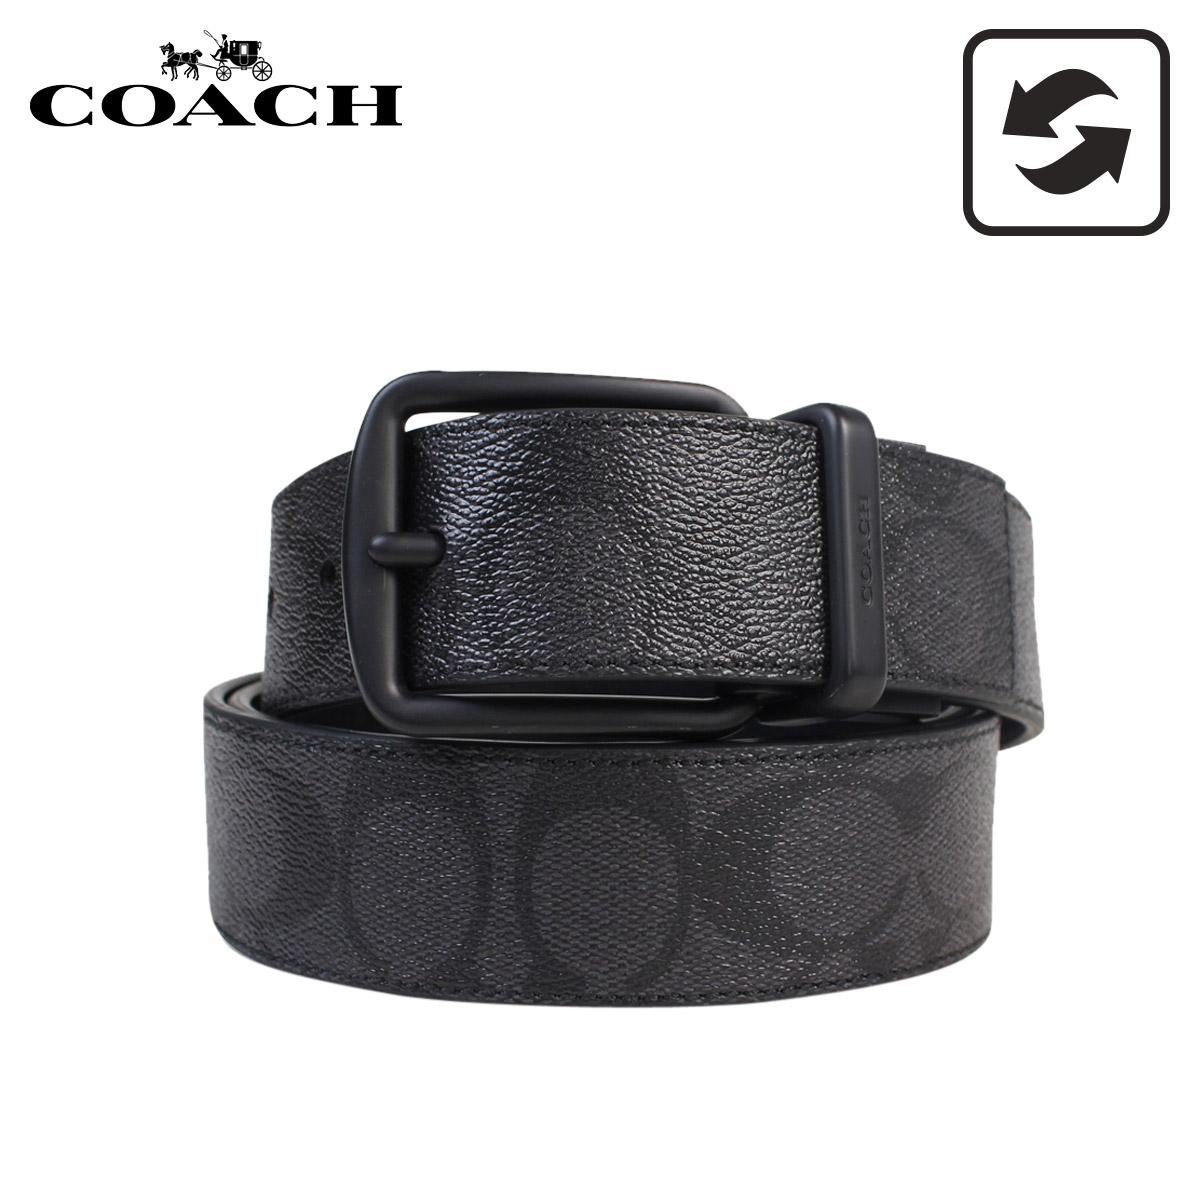 COACH F64839 BKBK コーチ ベルト メンズ 本革 レザー リバーシブル ビジネス ブラック